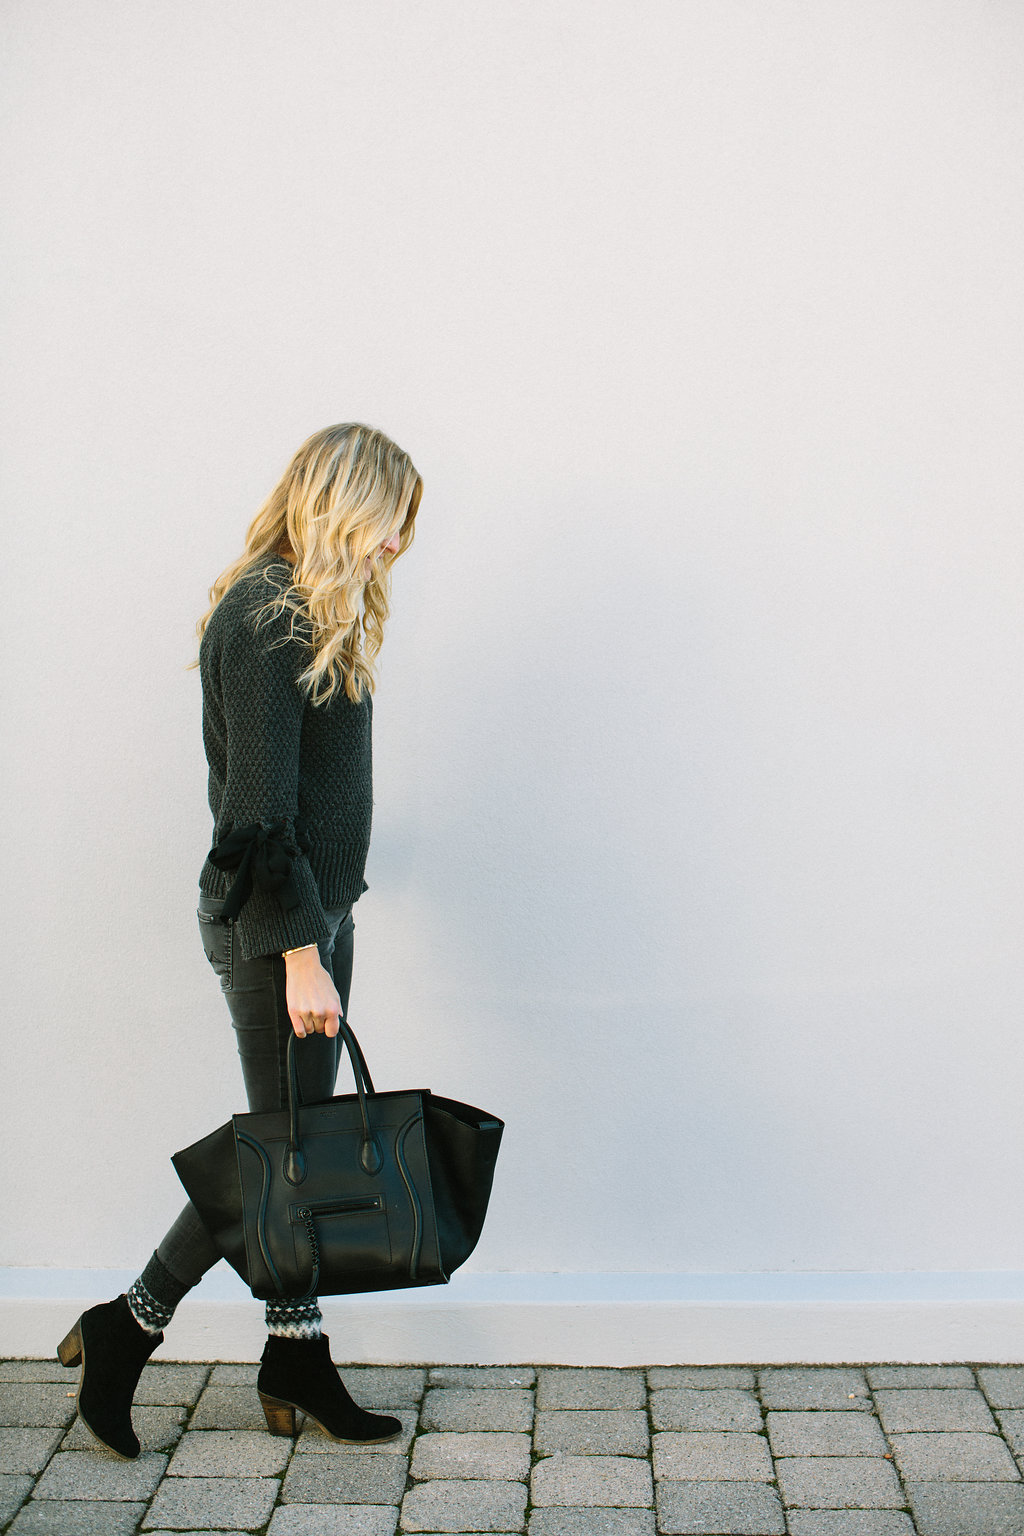 StephanieTrotta-clubmonaco-TheGirlGuide-LindsayMaddenPhotography-6.jpg